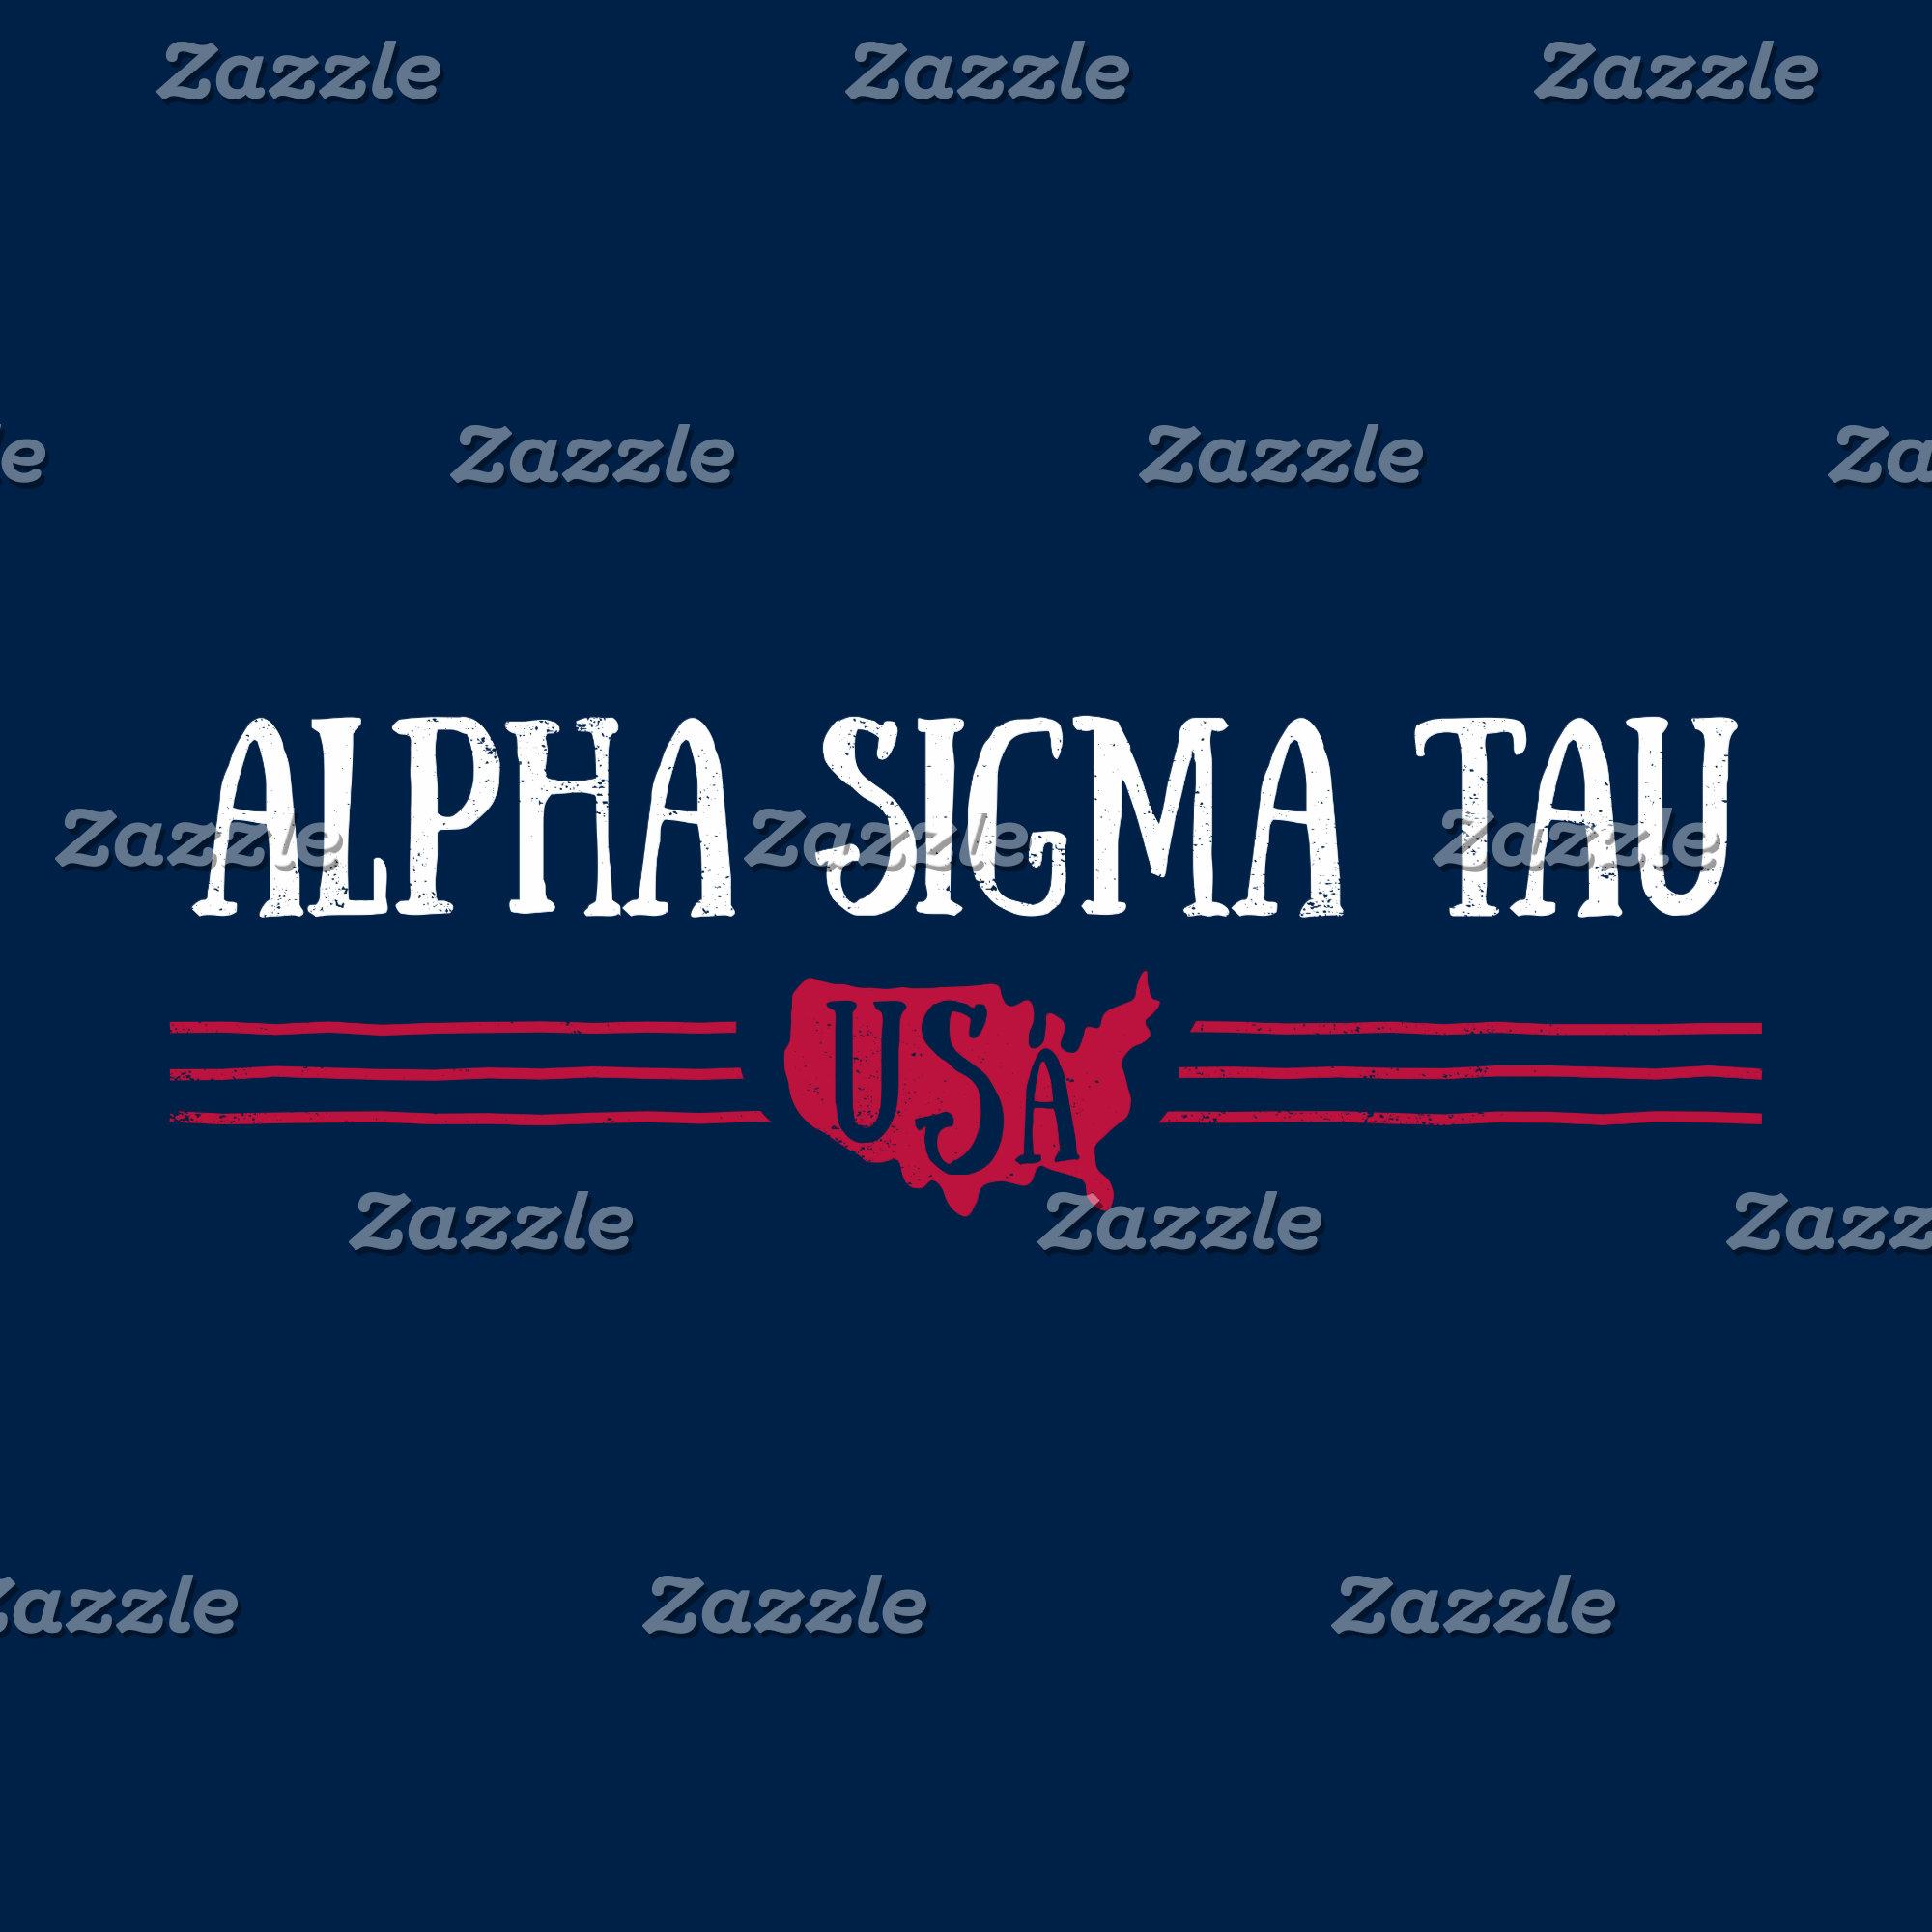 Alpha Sigma Tau - USA